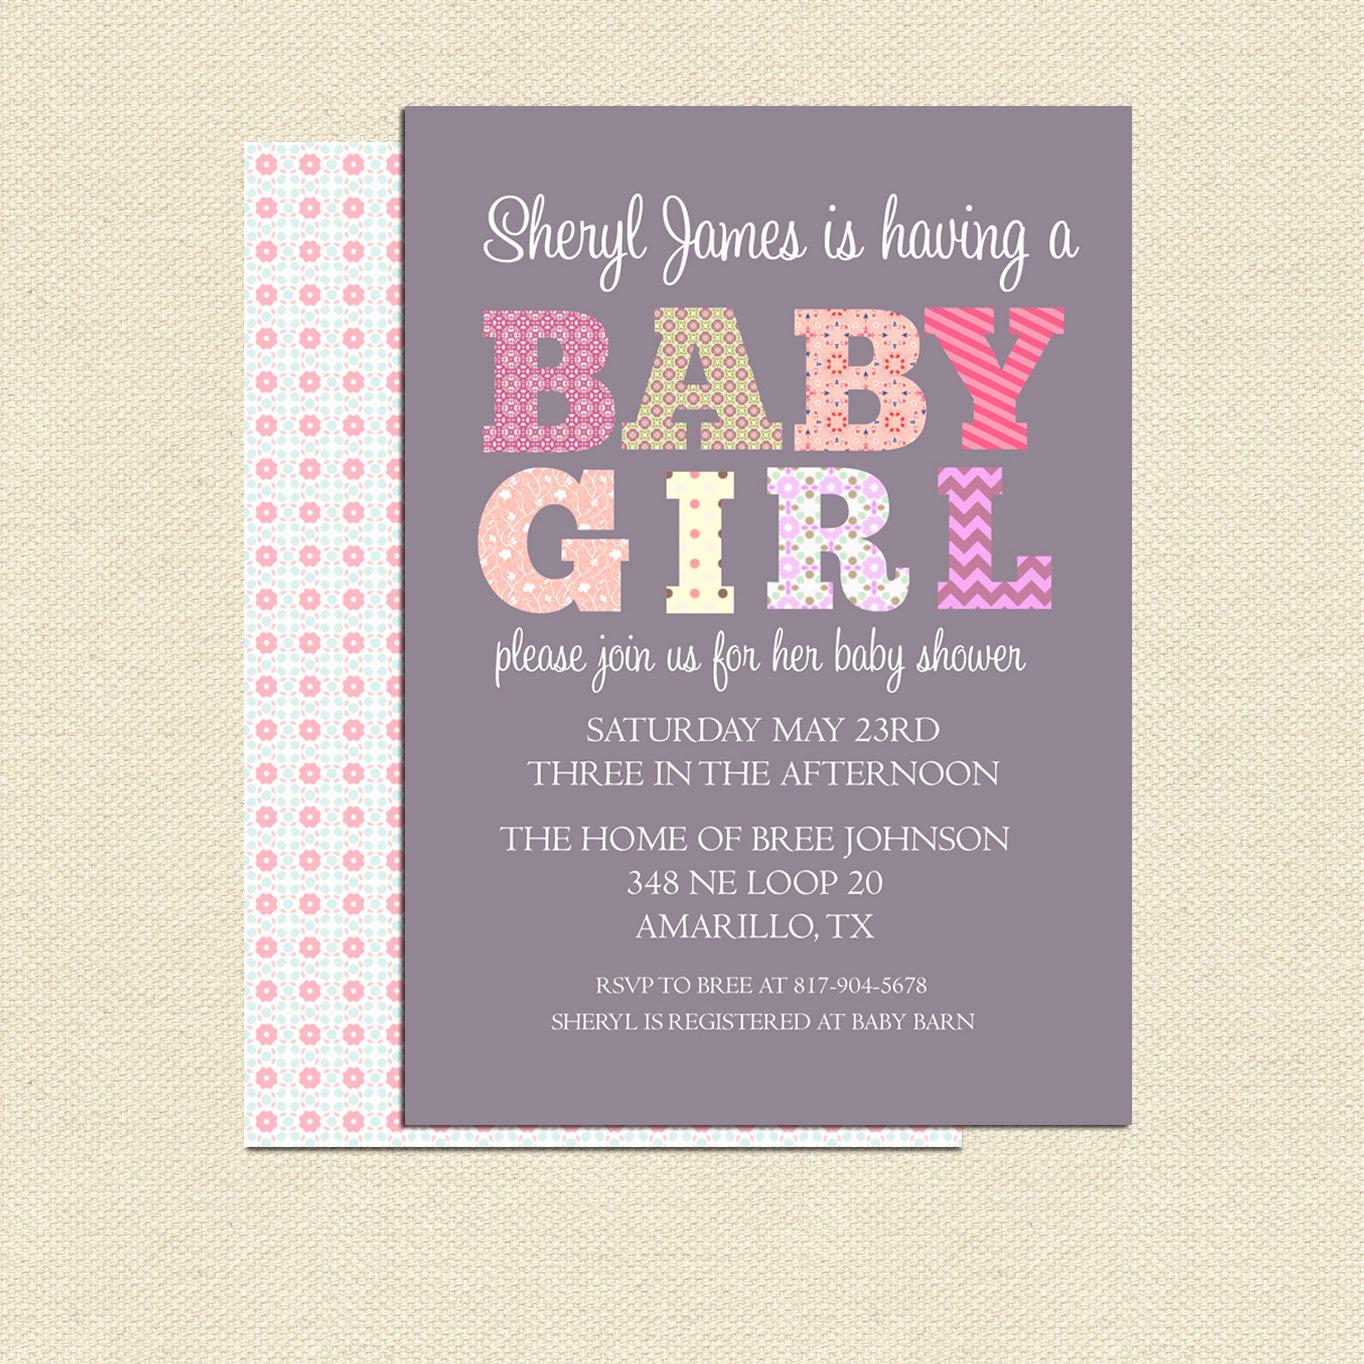 Diy Baby Shower Invitation Templates Unique Diy Printable Baby Shower Invitation for Girl No 2